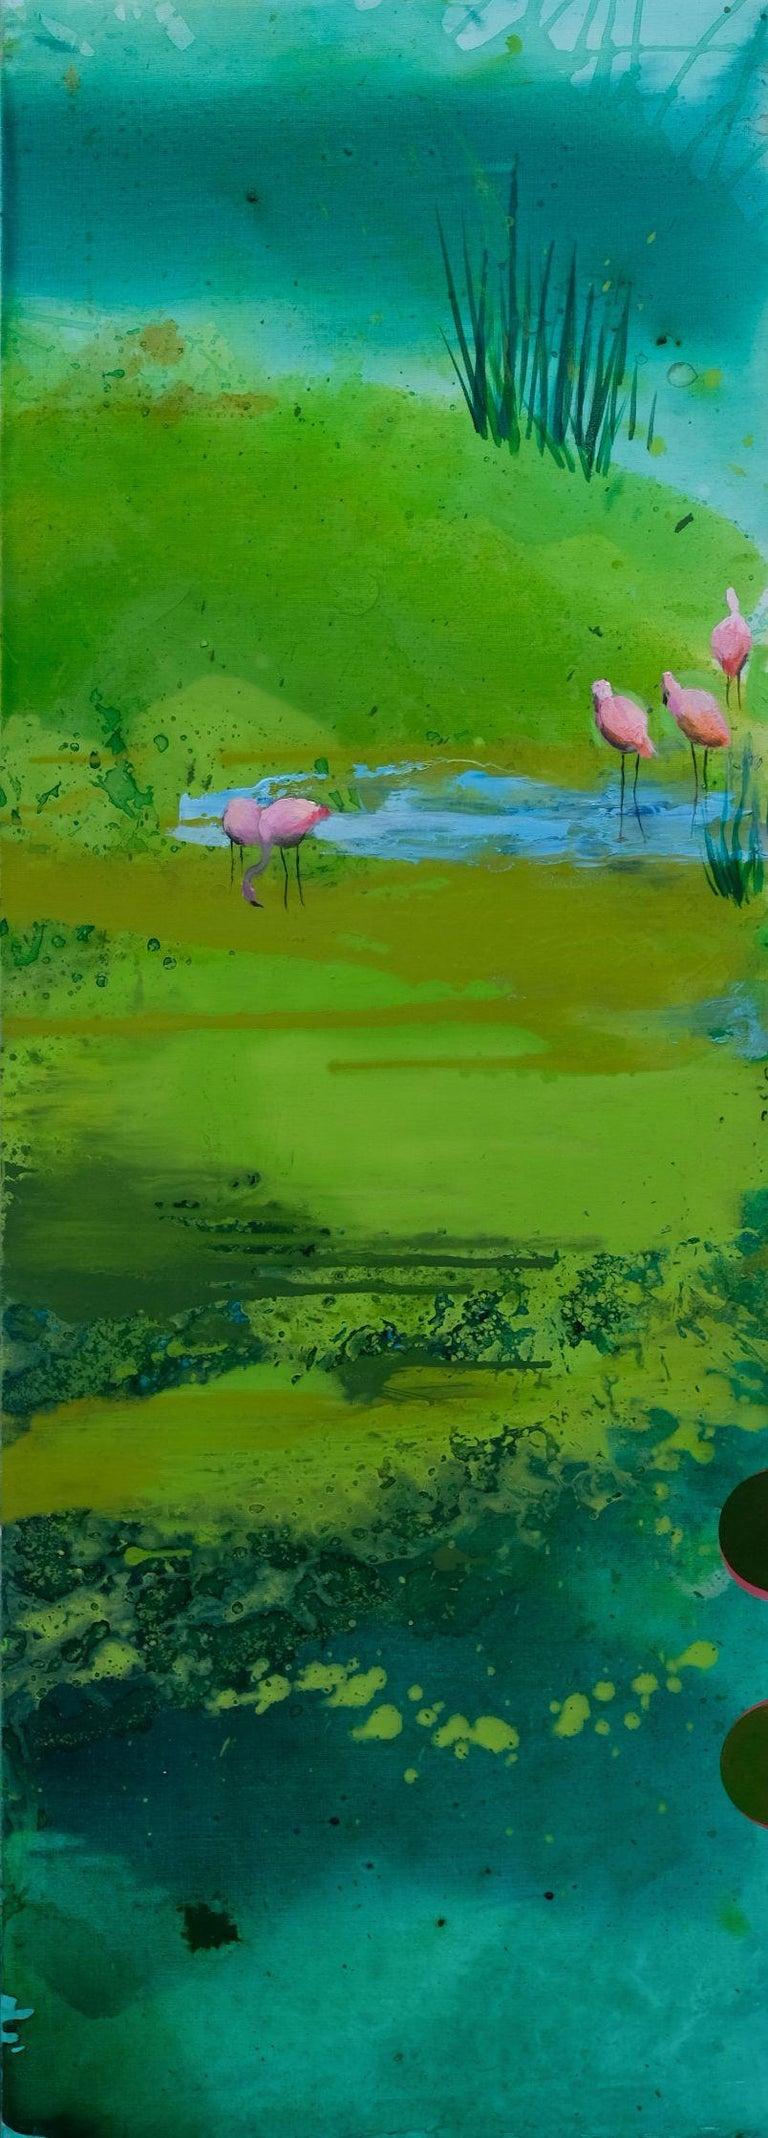 Agnieszka Zawisza Animal Painting - Pink Flamingos - Modern Landscape Oil Painting, Lake View, Nature, Green Tones